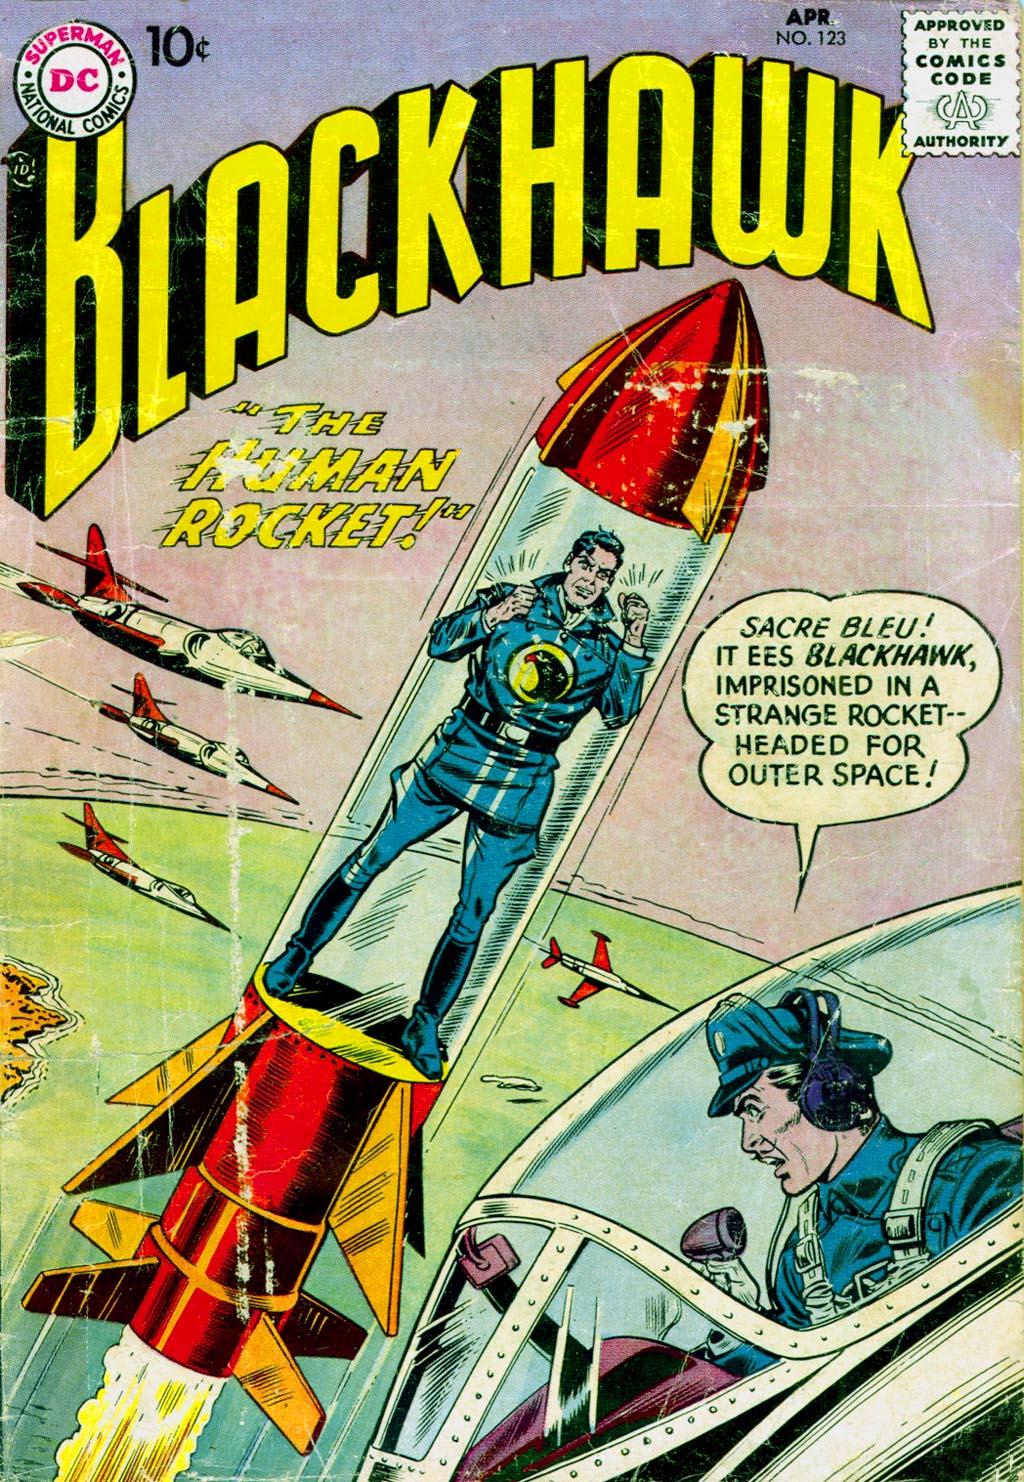 Blackhawk 1957 Issue 123 Viewcomic Reading Comics Online For Free 2019